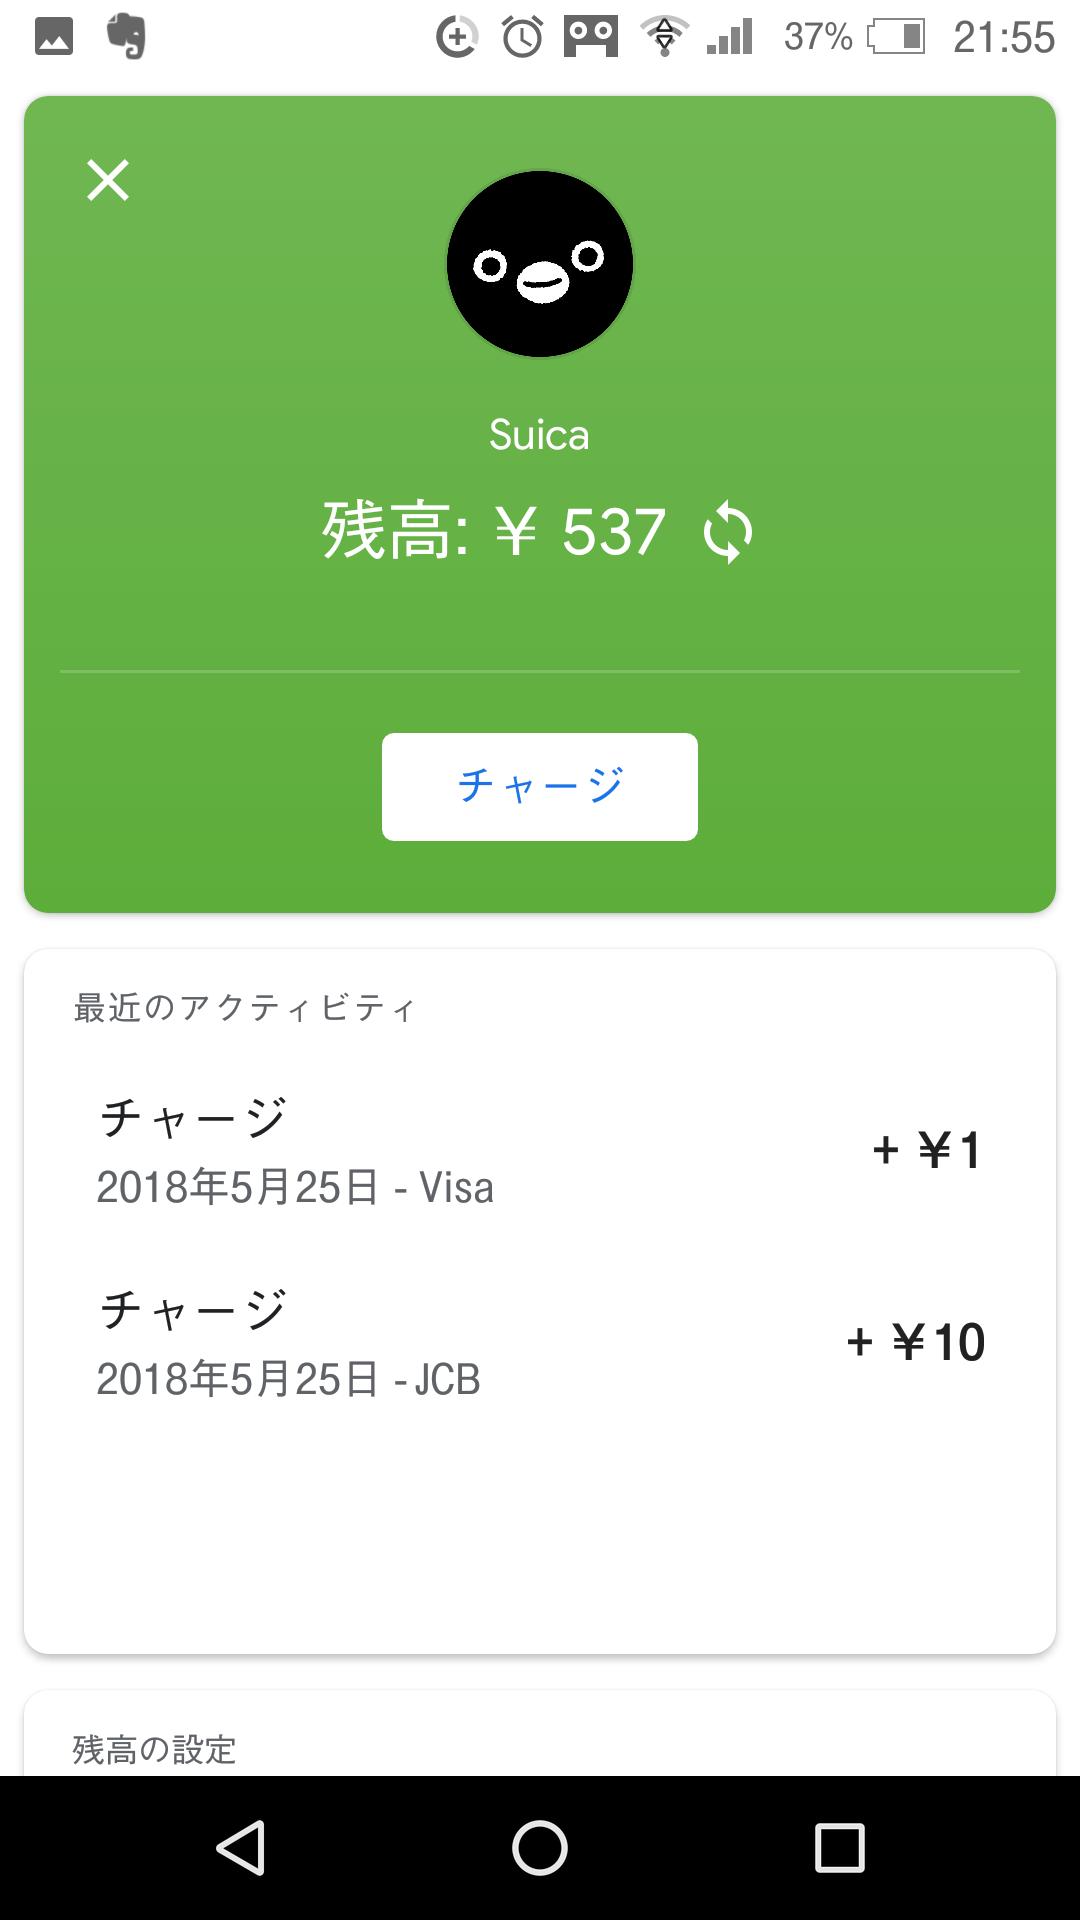 f:id:hasegawaryouta1993420:20180525223622p:plain